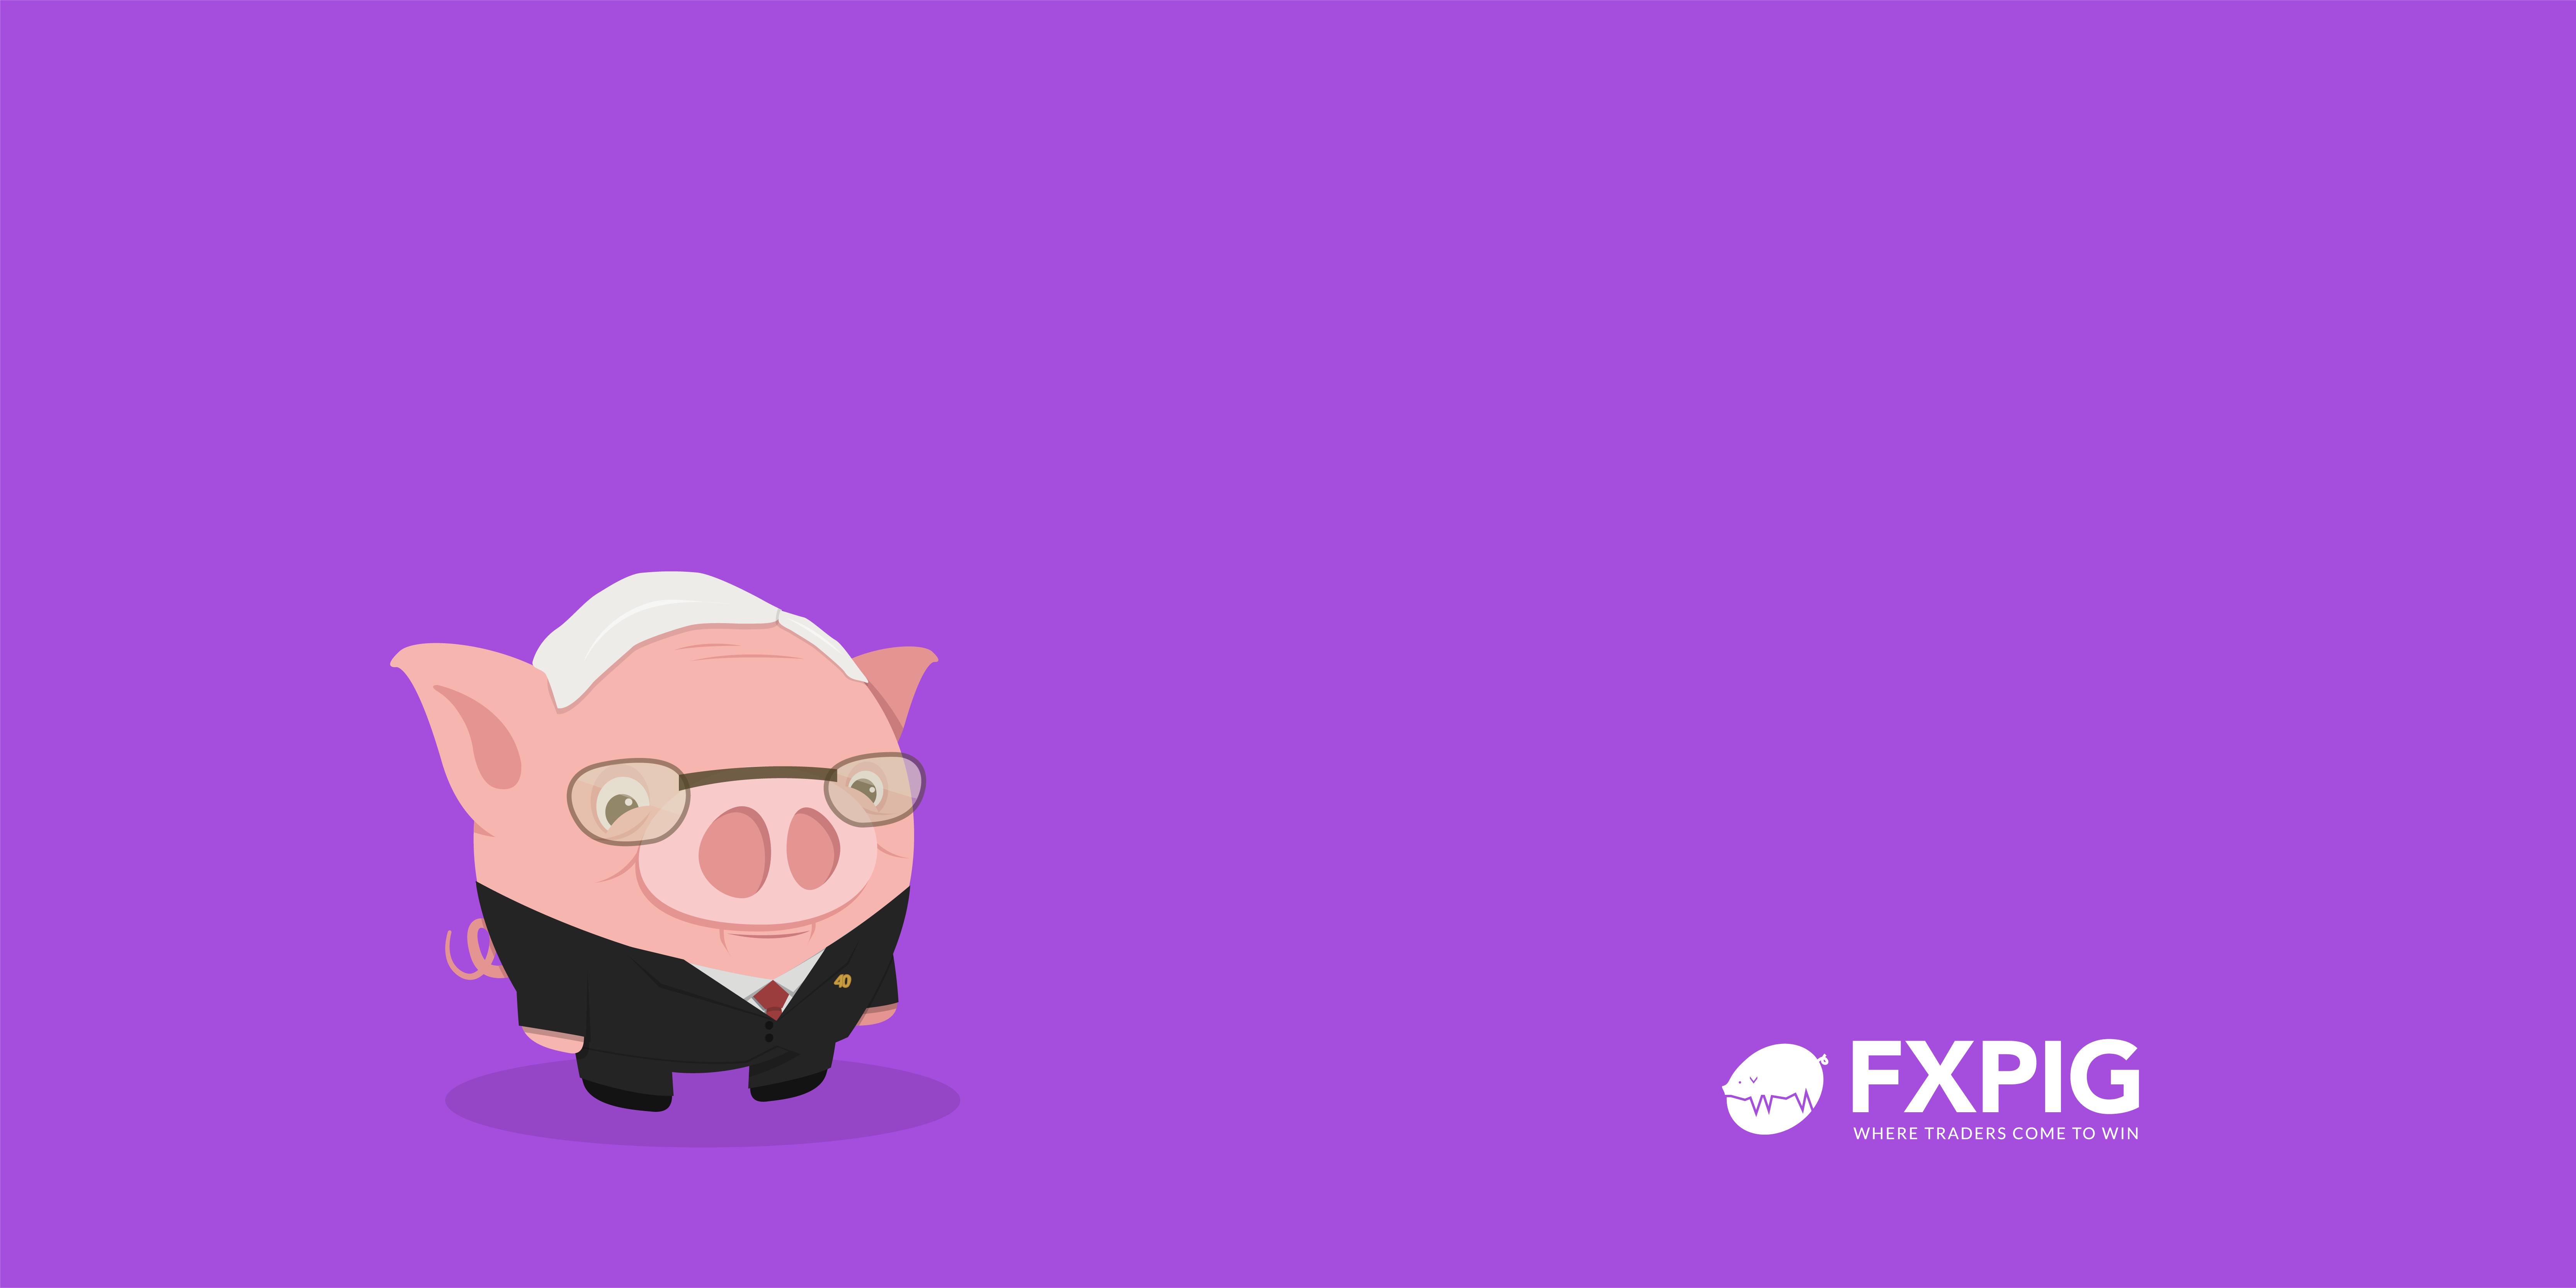 FOREX-trading-quote_warren-buffett-wisdom_FXPIG